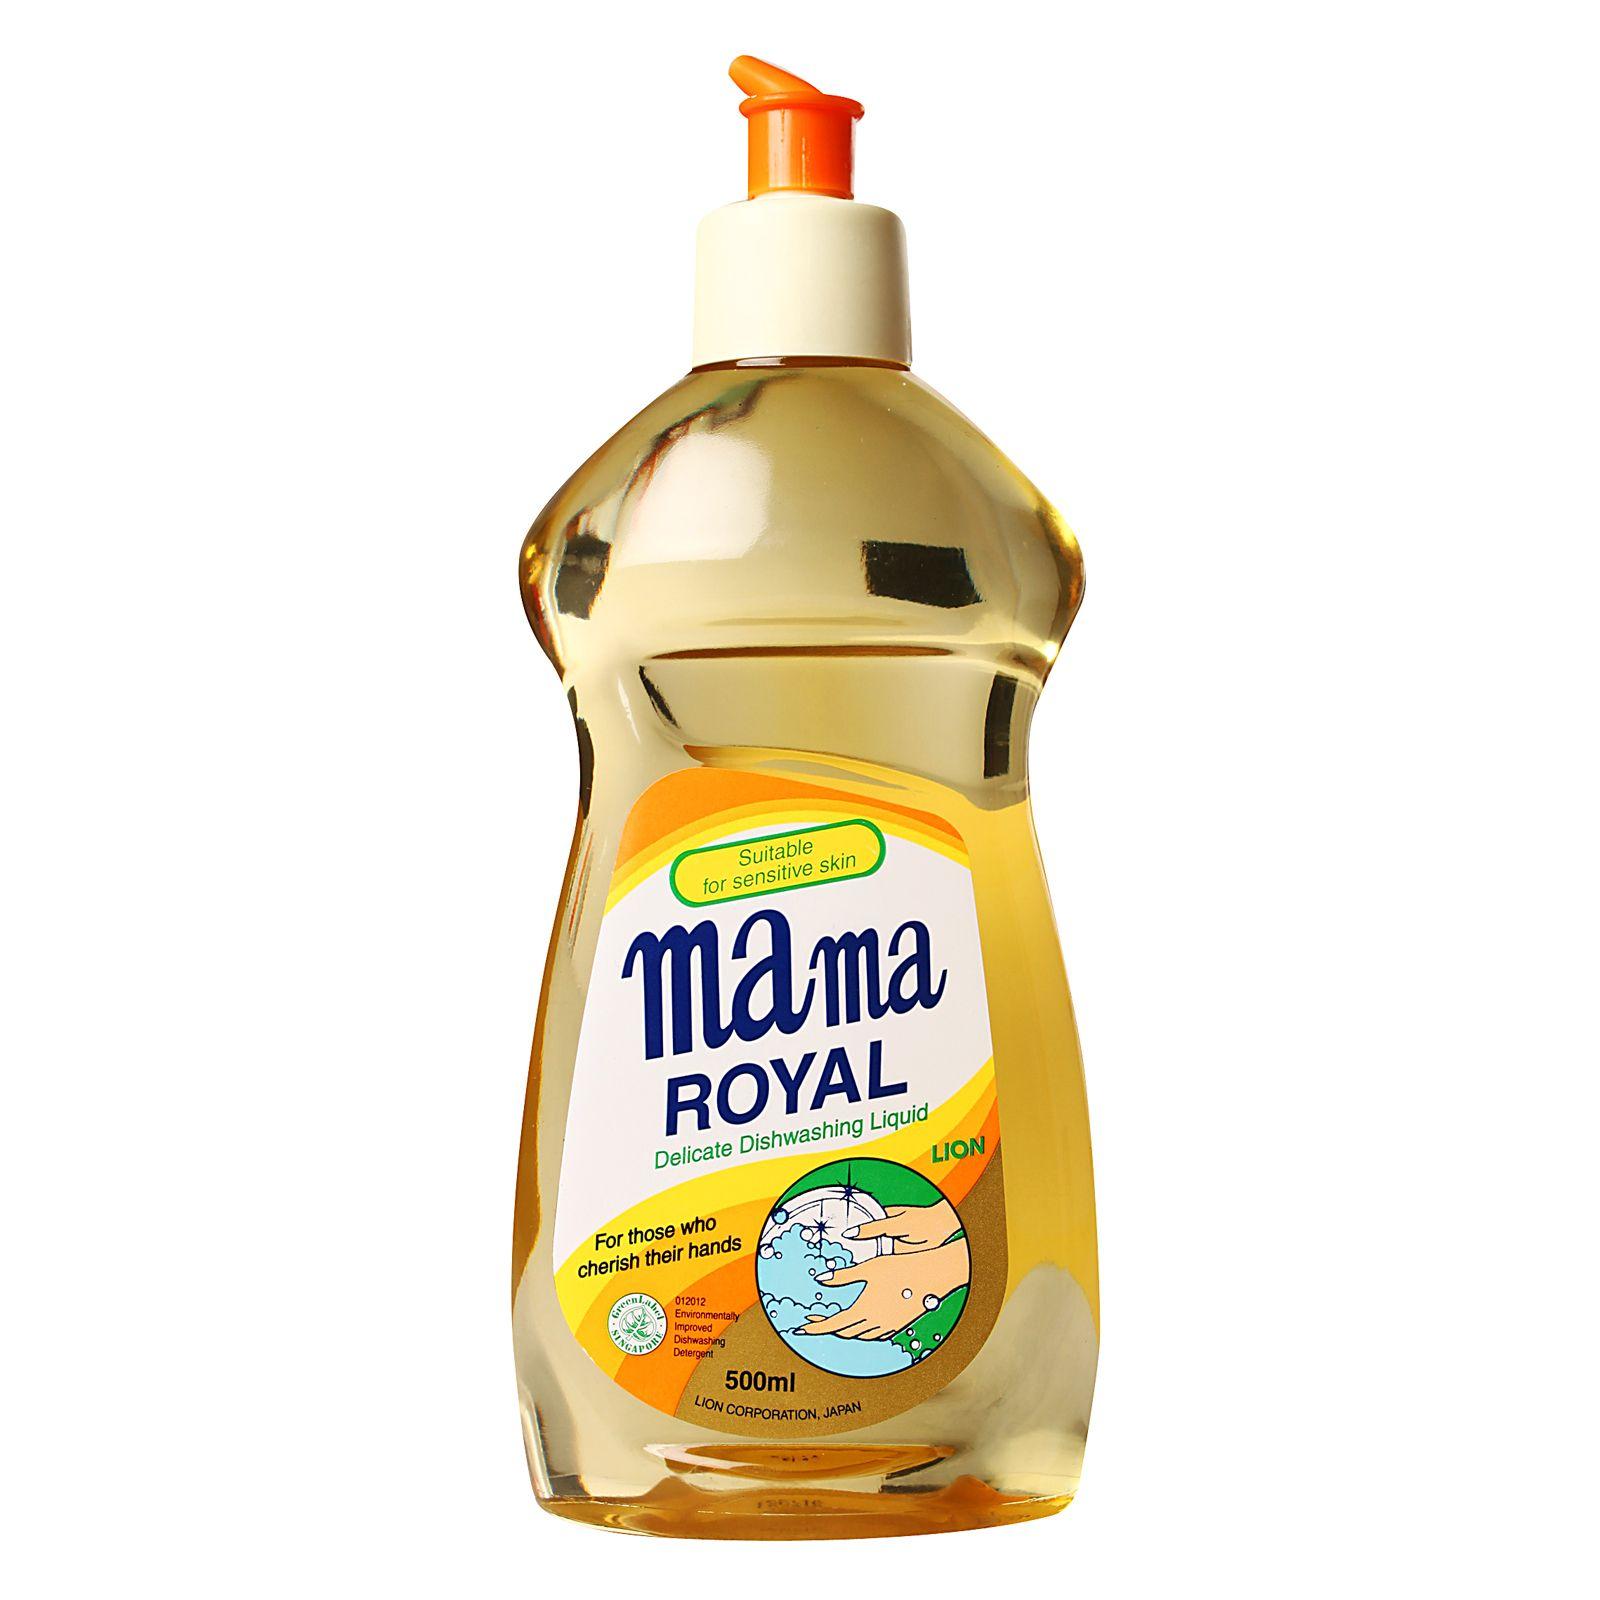 IMG_5285.JPG (1600×1600) Detergent product, Fruit logo